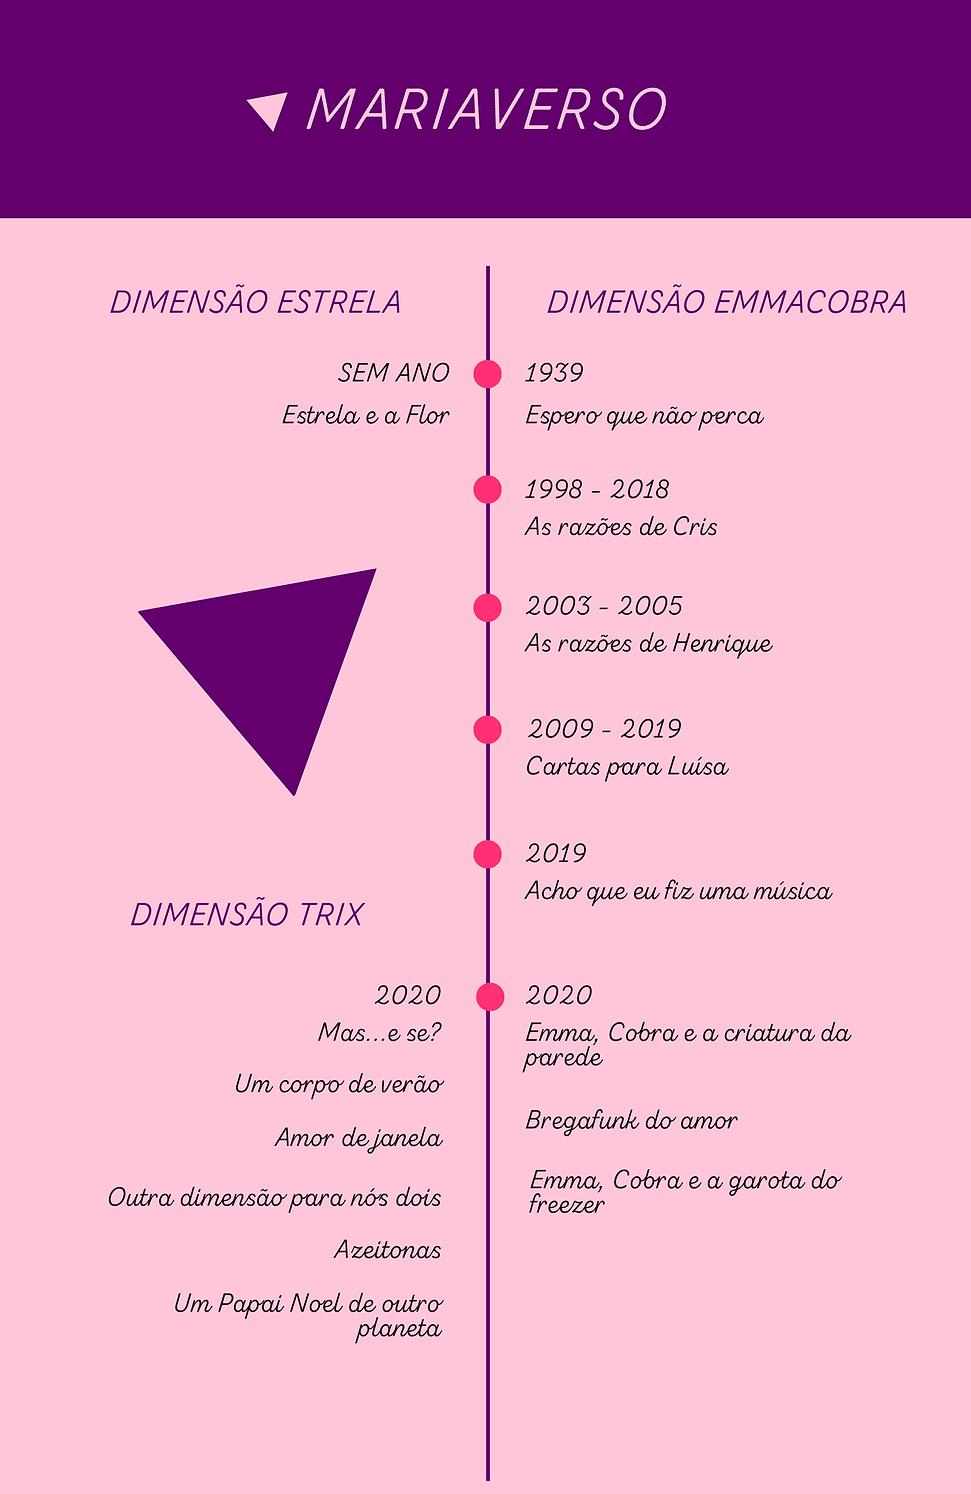 MARIAVERSO infográfico (1).png